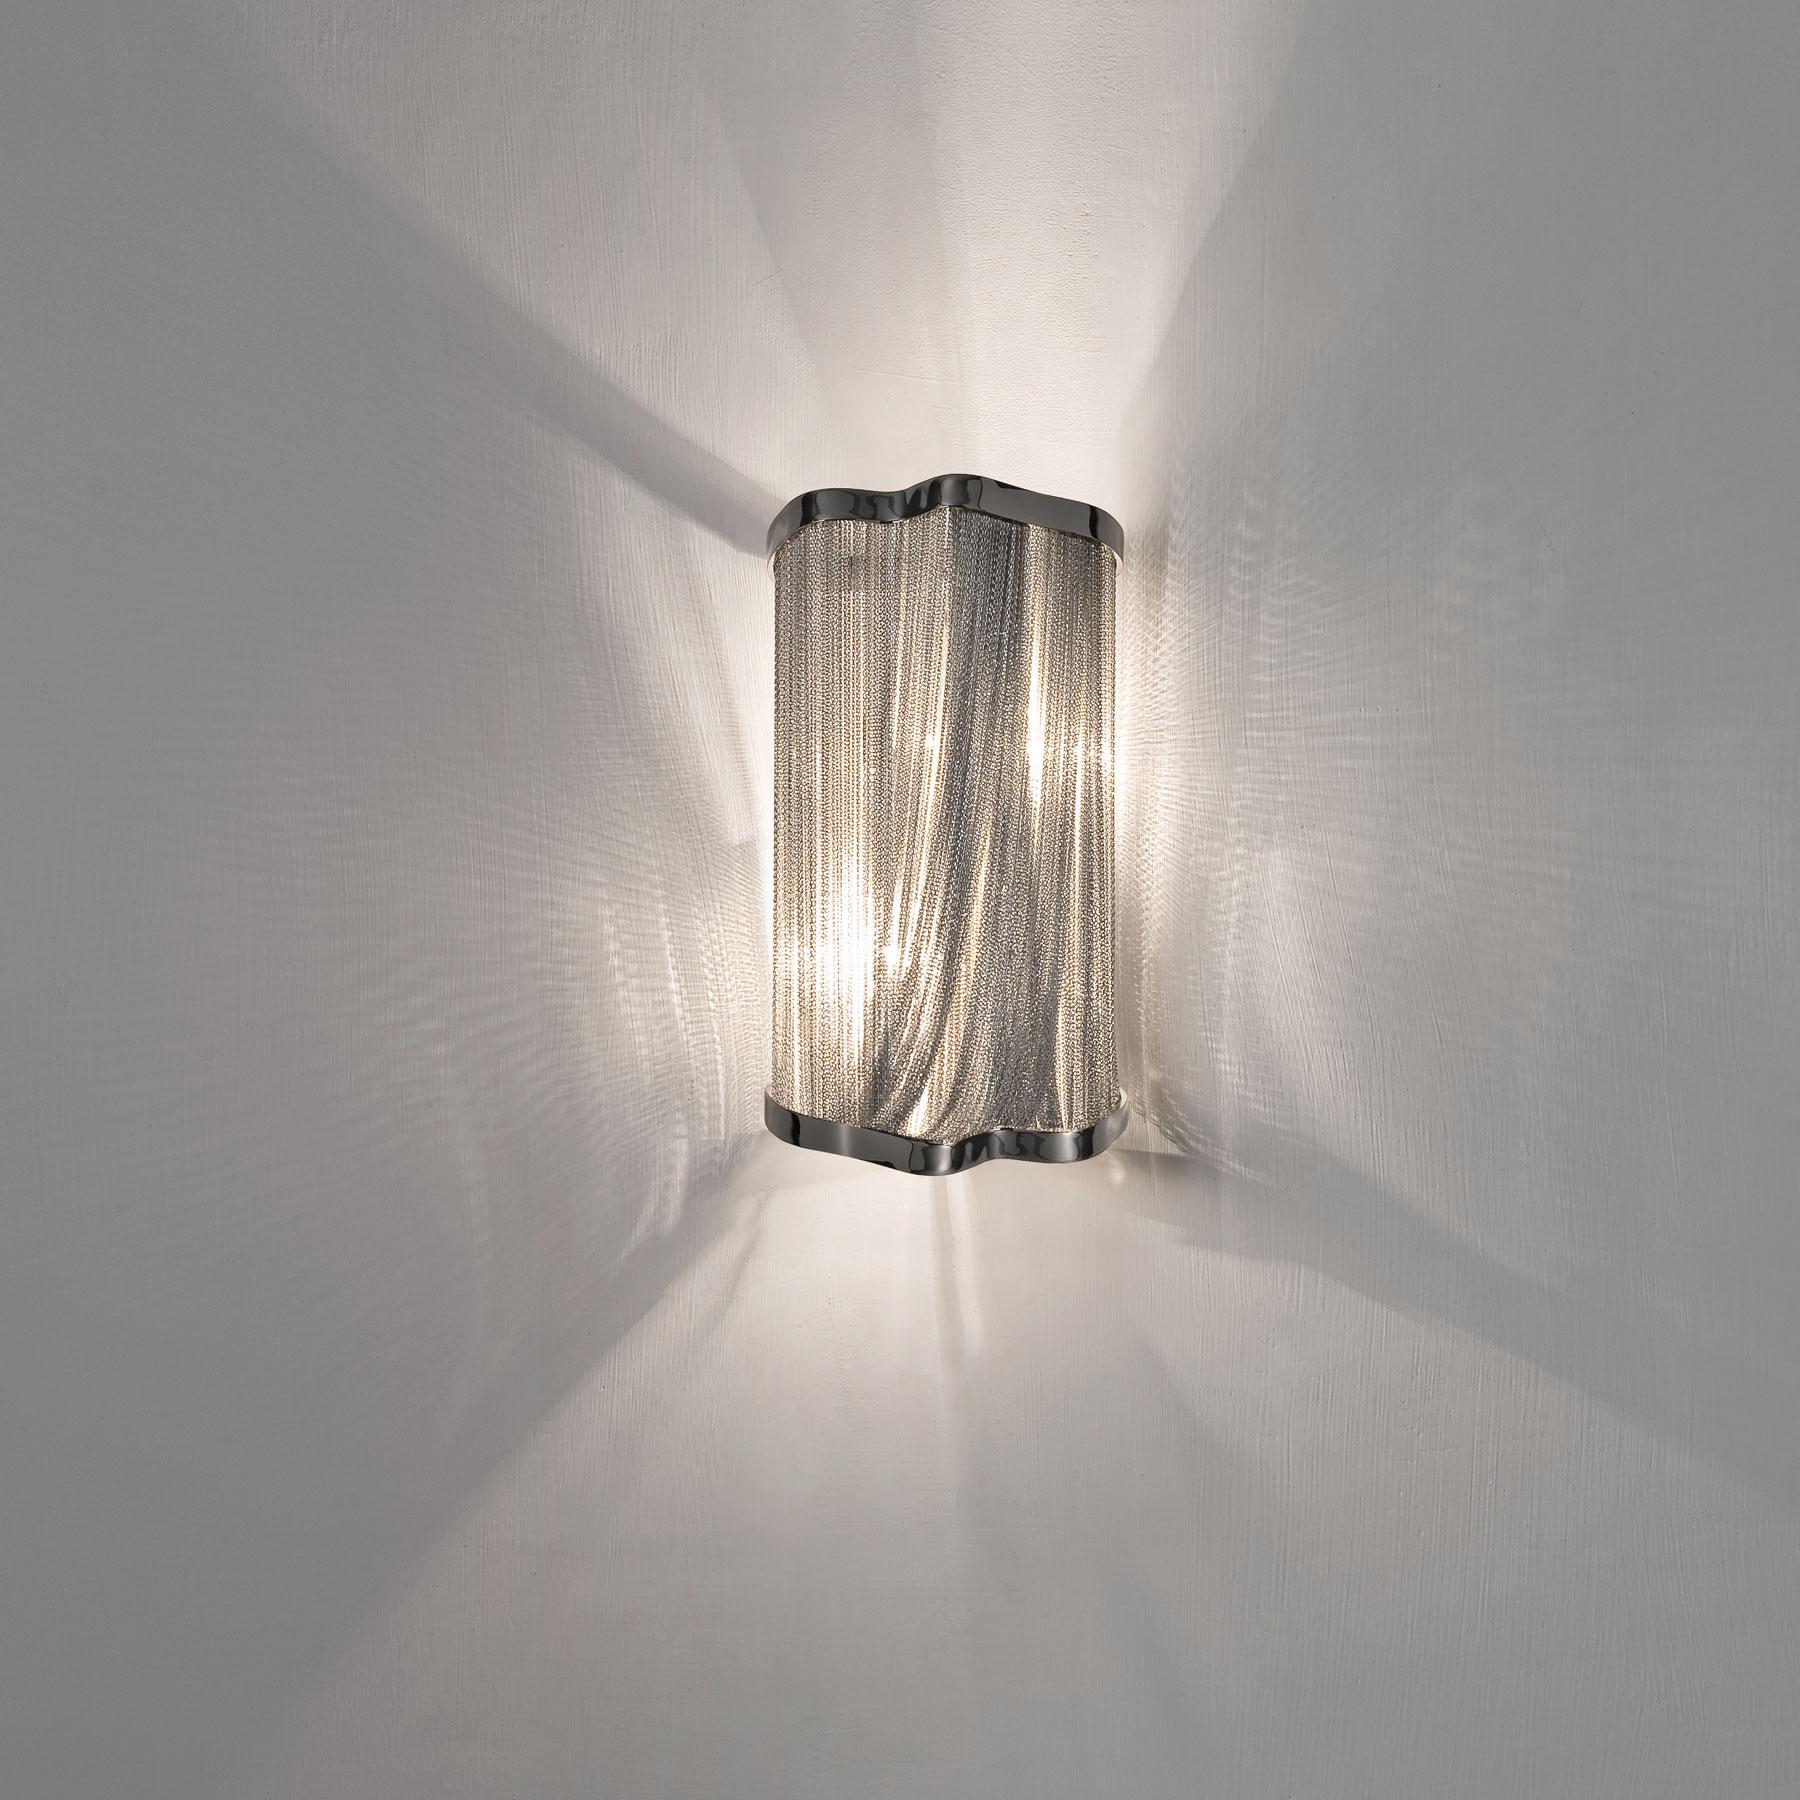 atlantis small wall lamp by terzani usa    0j04ae7c8a ZXMHBWV